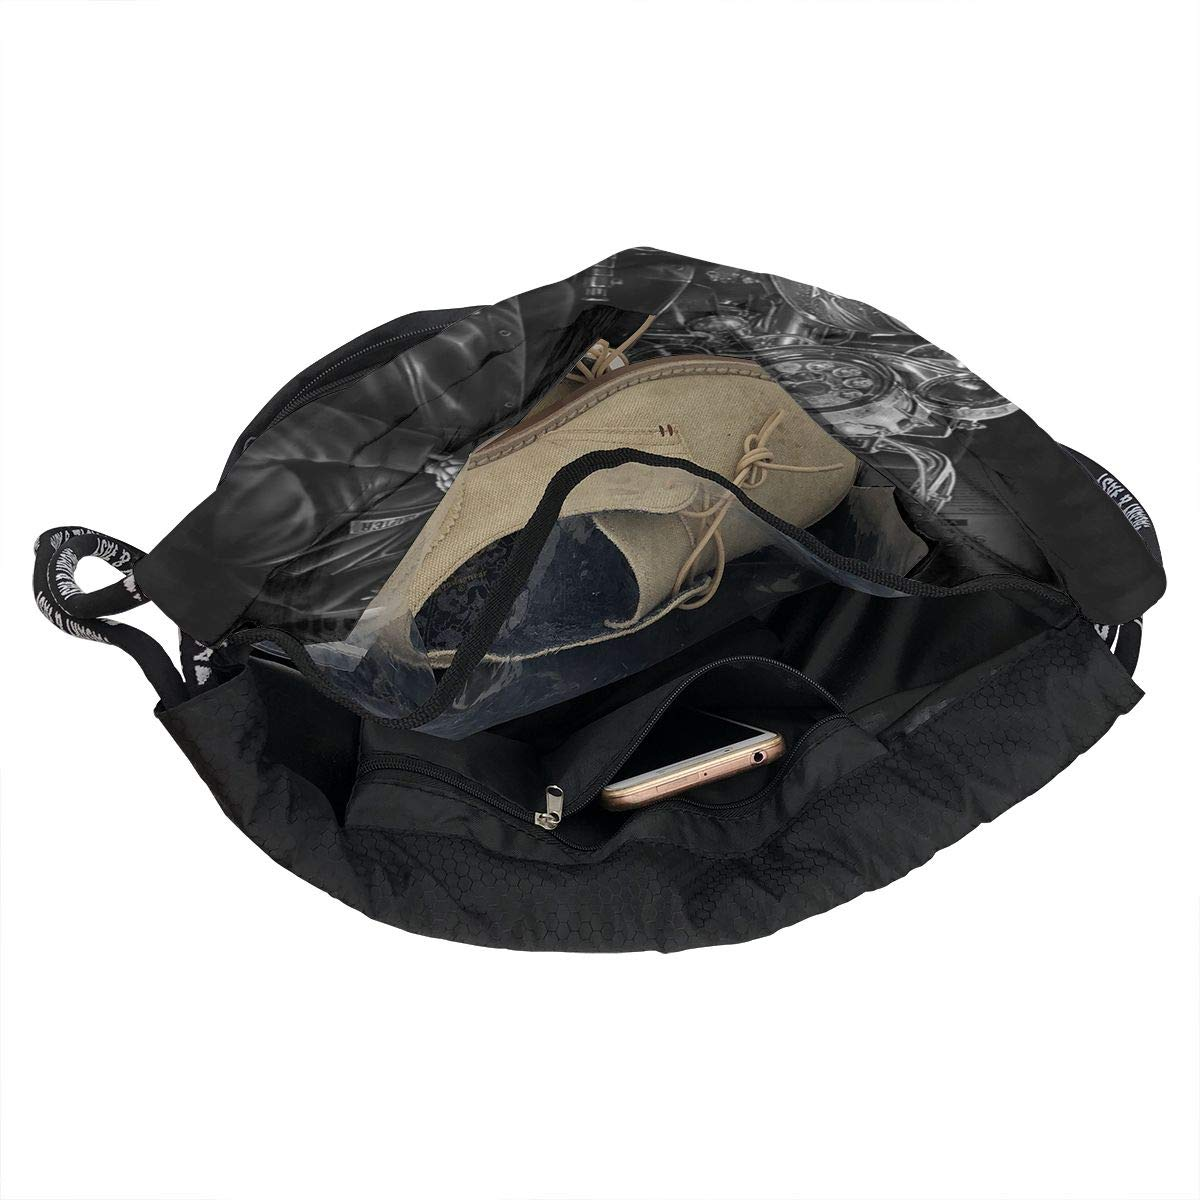 Ride Or Die Biker And Motocycle Multifunctional Bundle Backpack Shoulder Bag For Men And Women